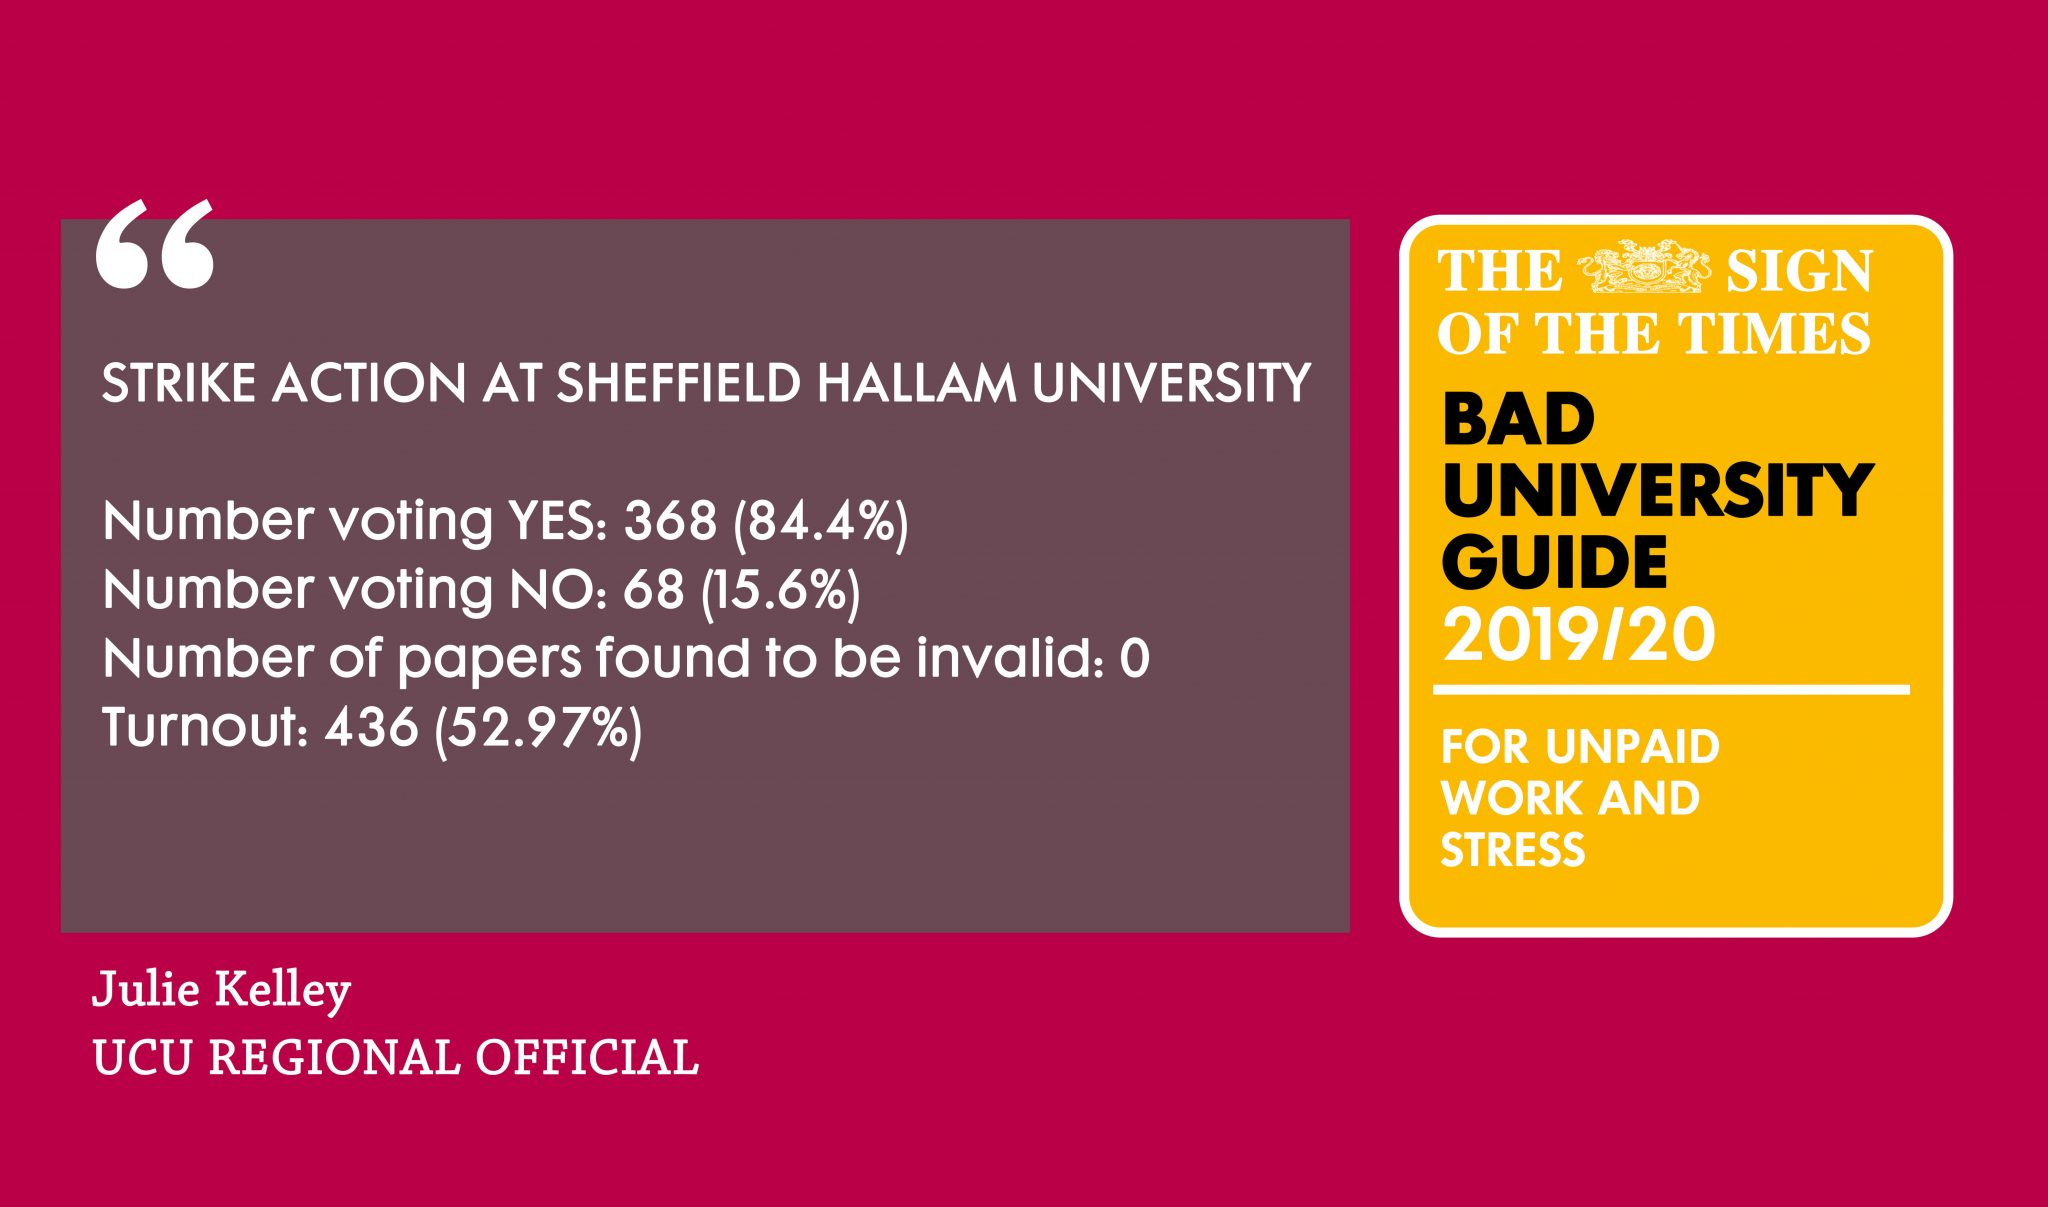 bad university of the year 2